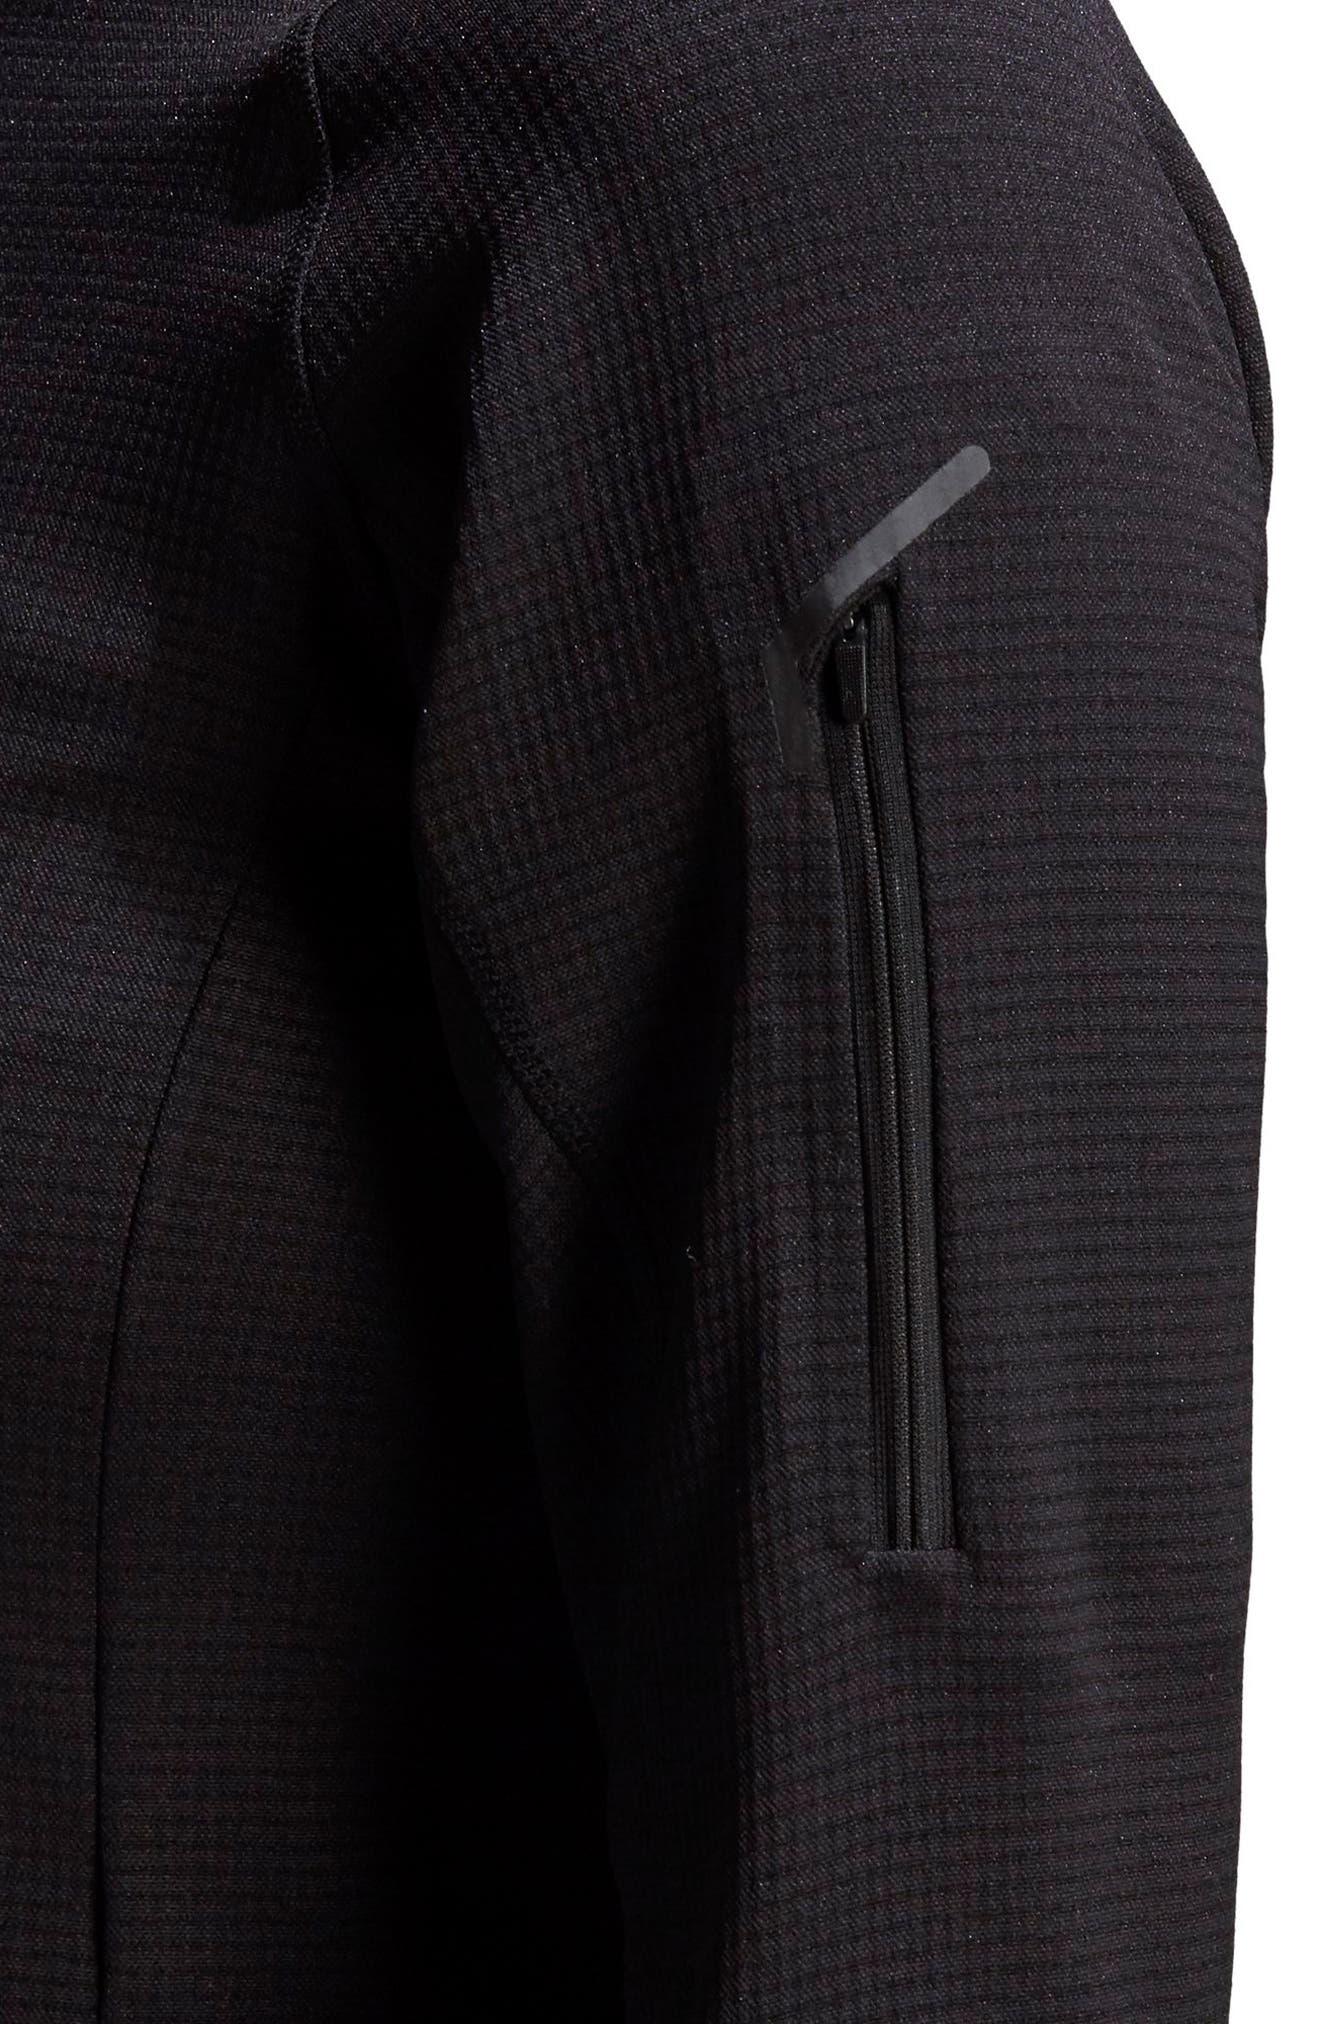 ADIDAS, Stockhorn Fleece Jacket, Alternate thumbnail 8, color, BLACK